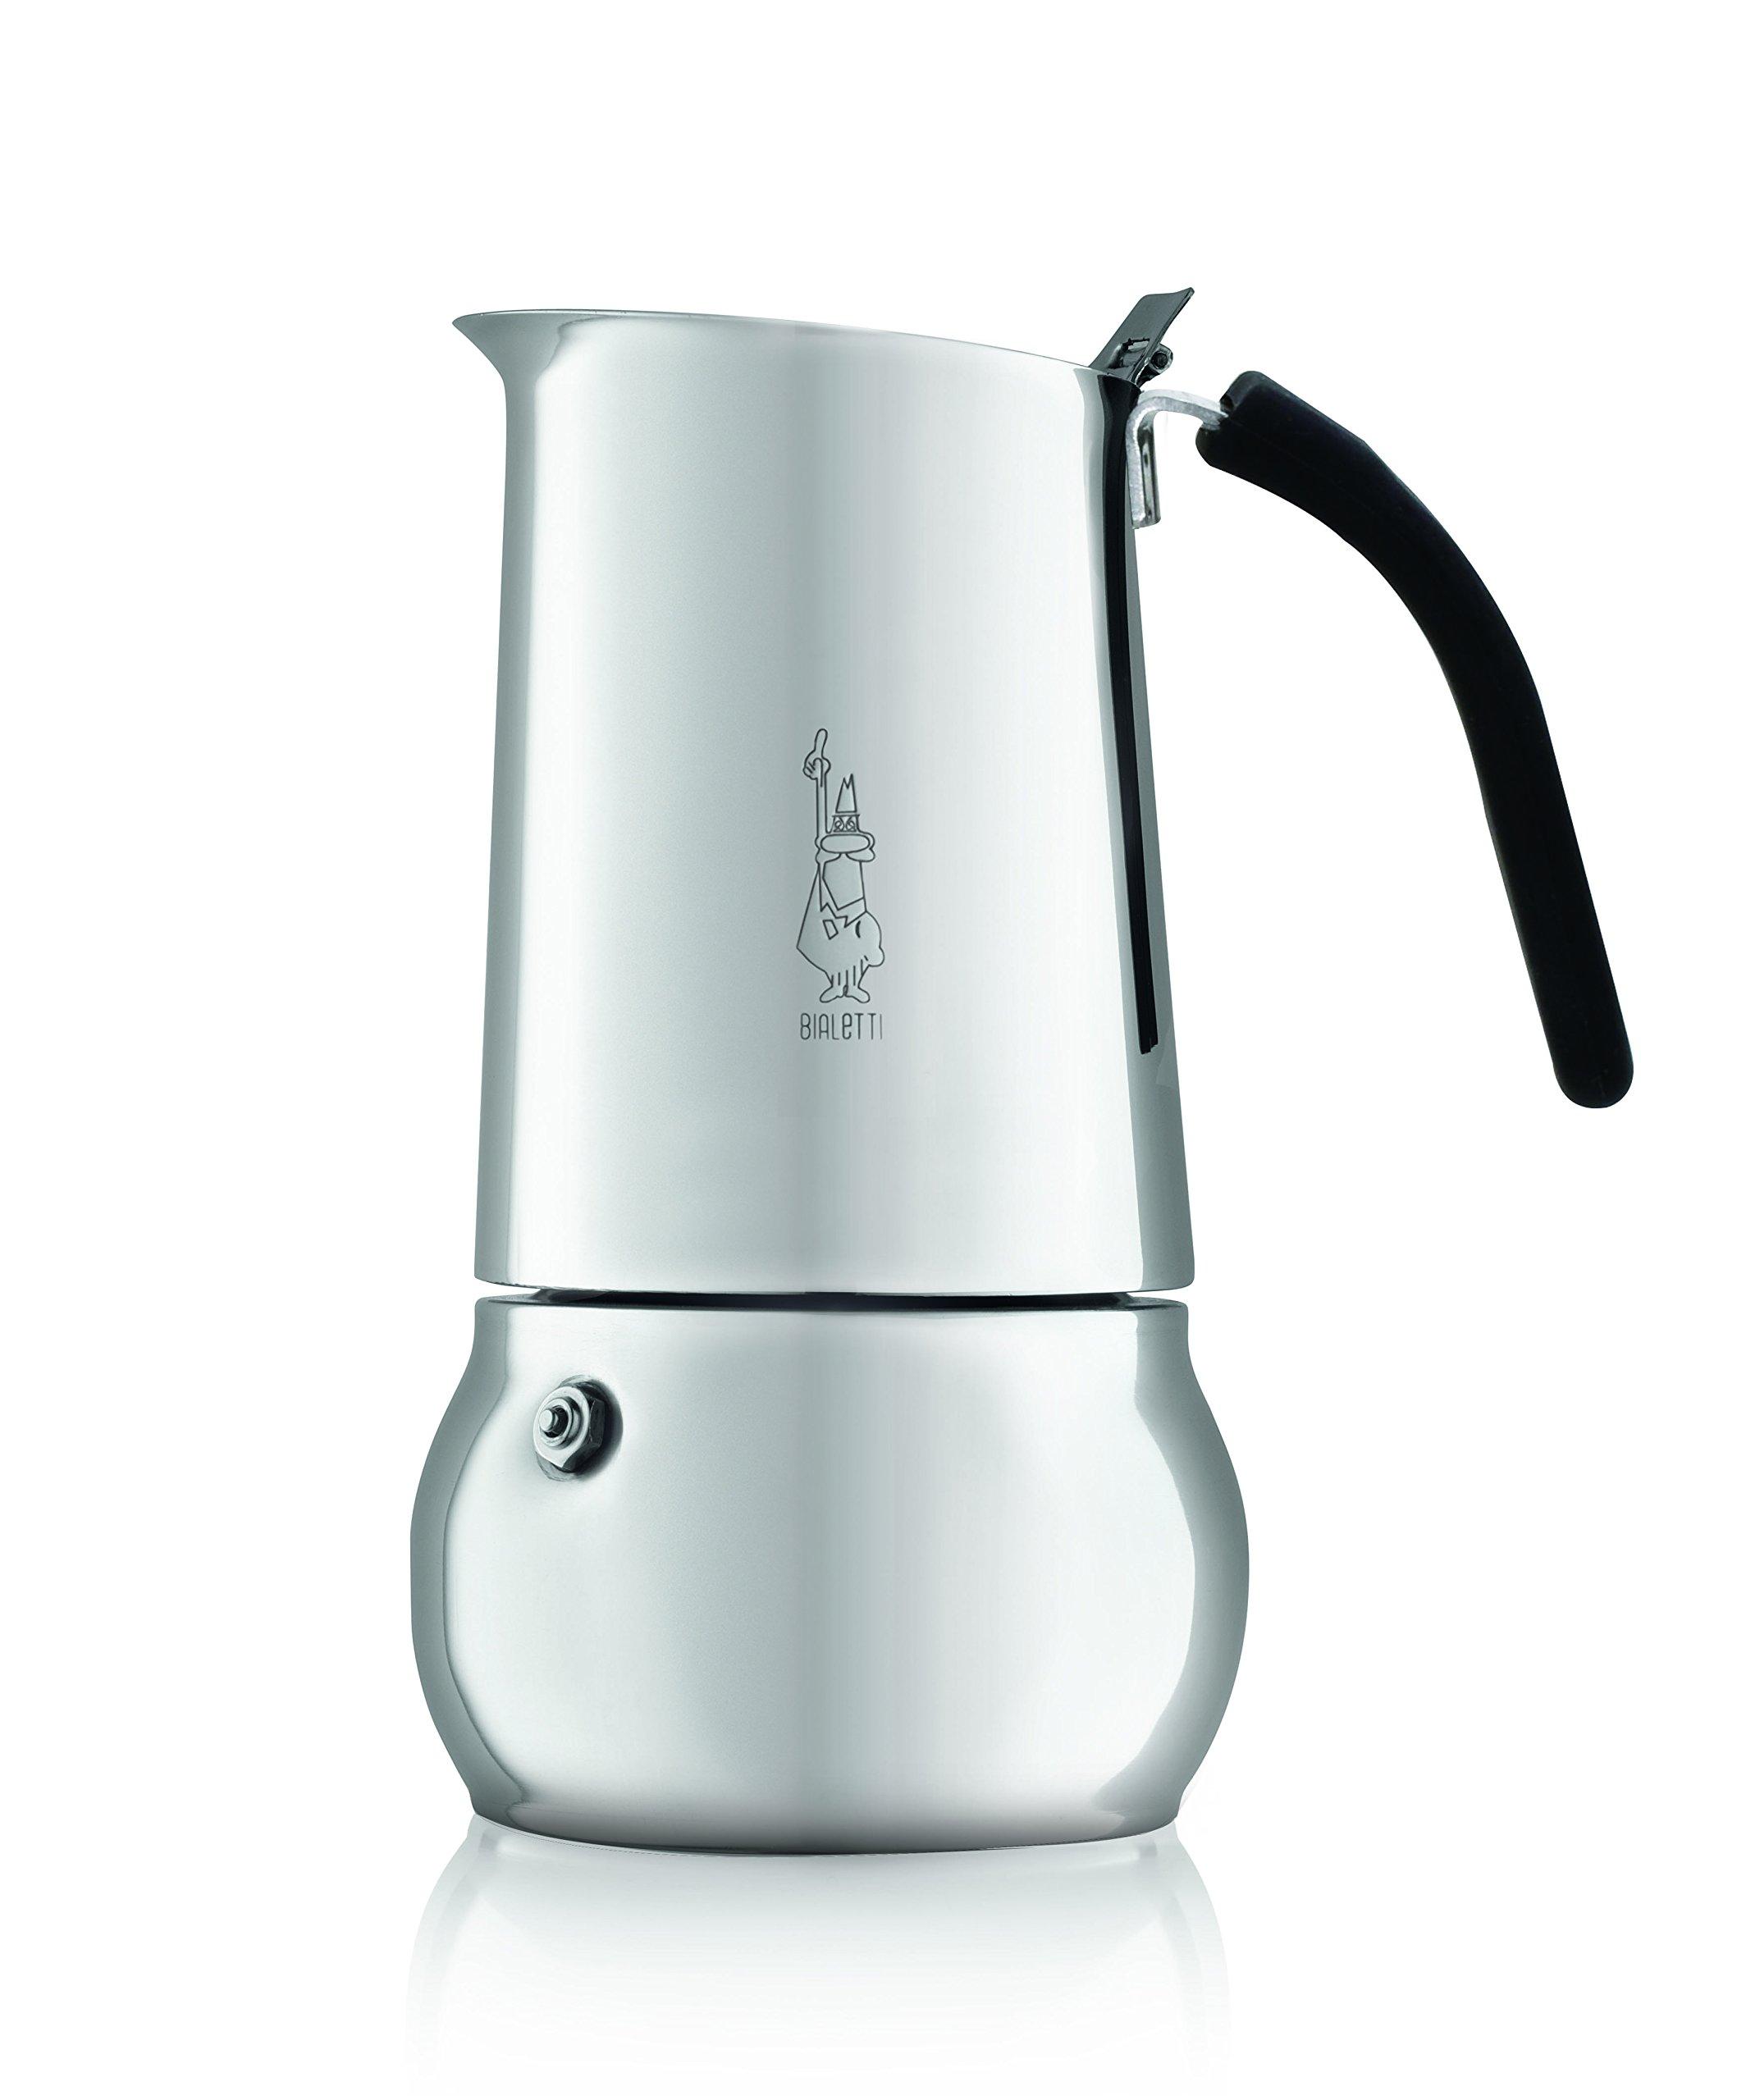 Kitty 4 Cups Stainless steel Moka Espresso maker